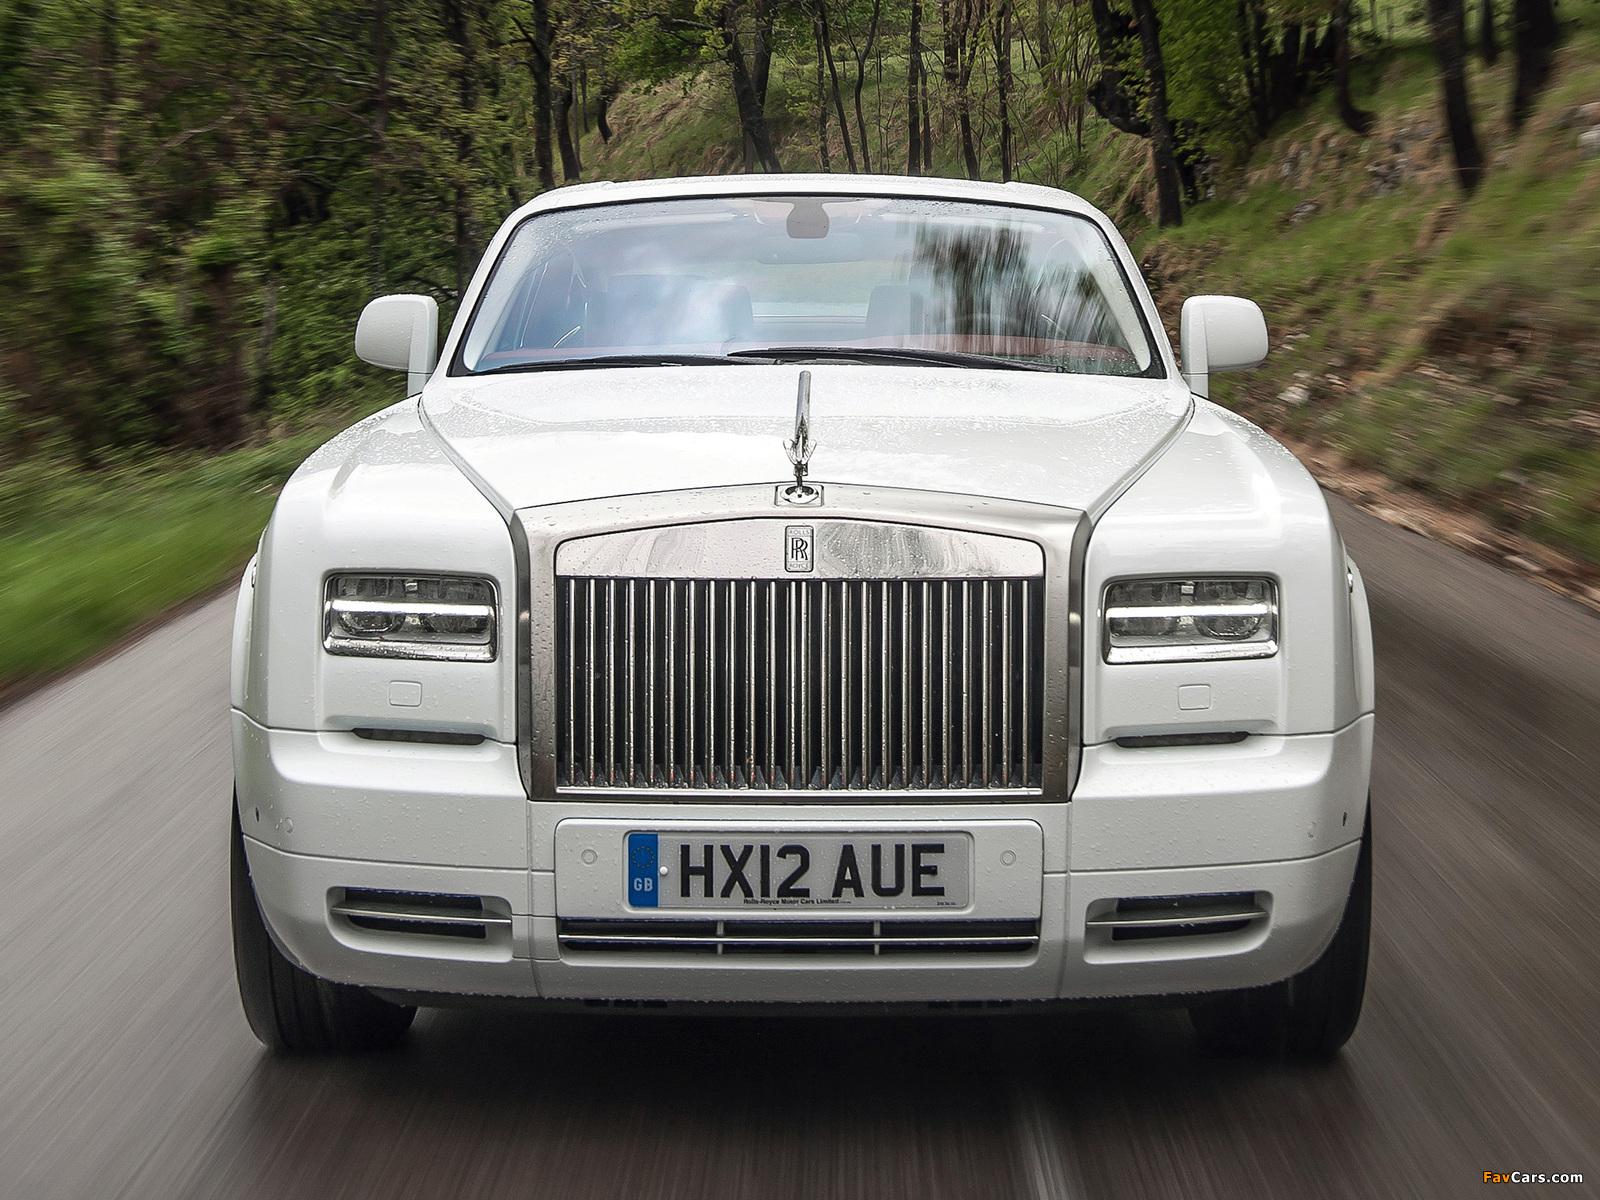 Rolls-Royce Phantom Coupe 2012 photos (1600 x 1200)